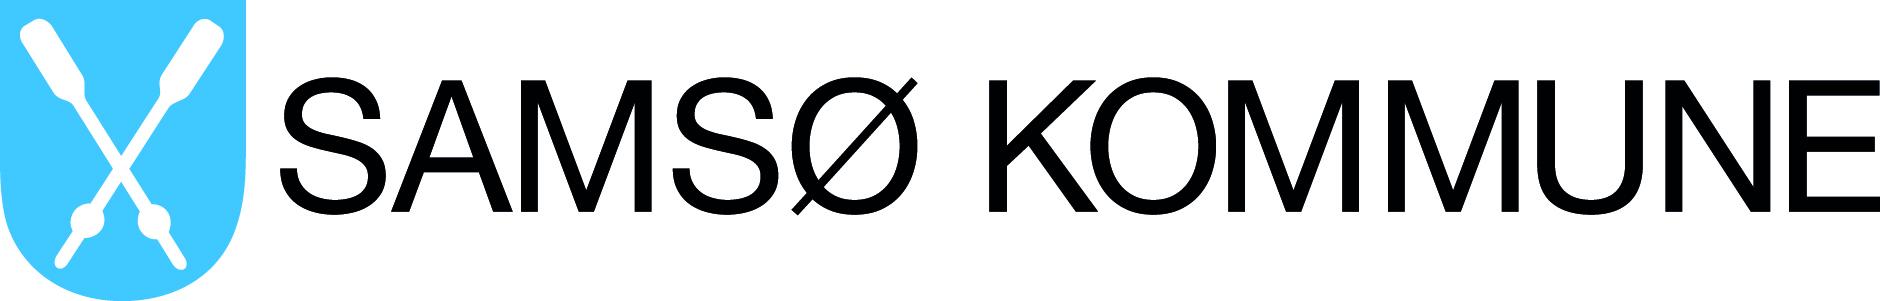 Samsø Kommune logo 2016 Final